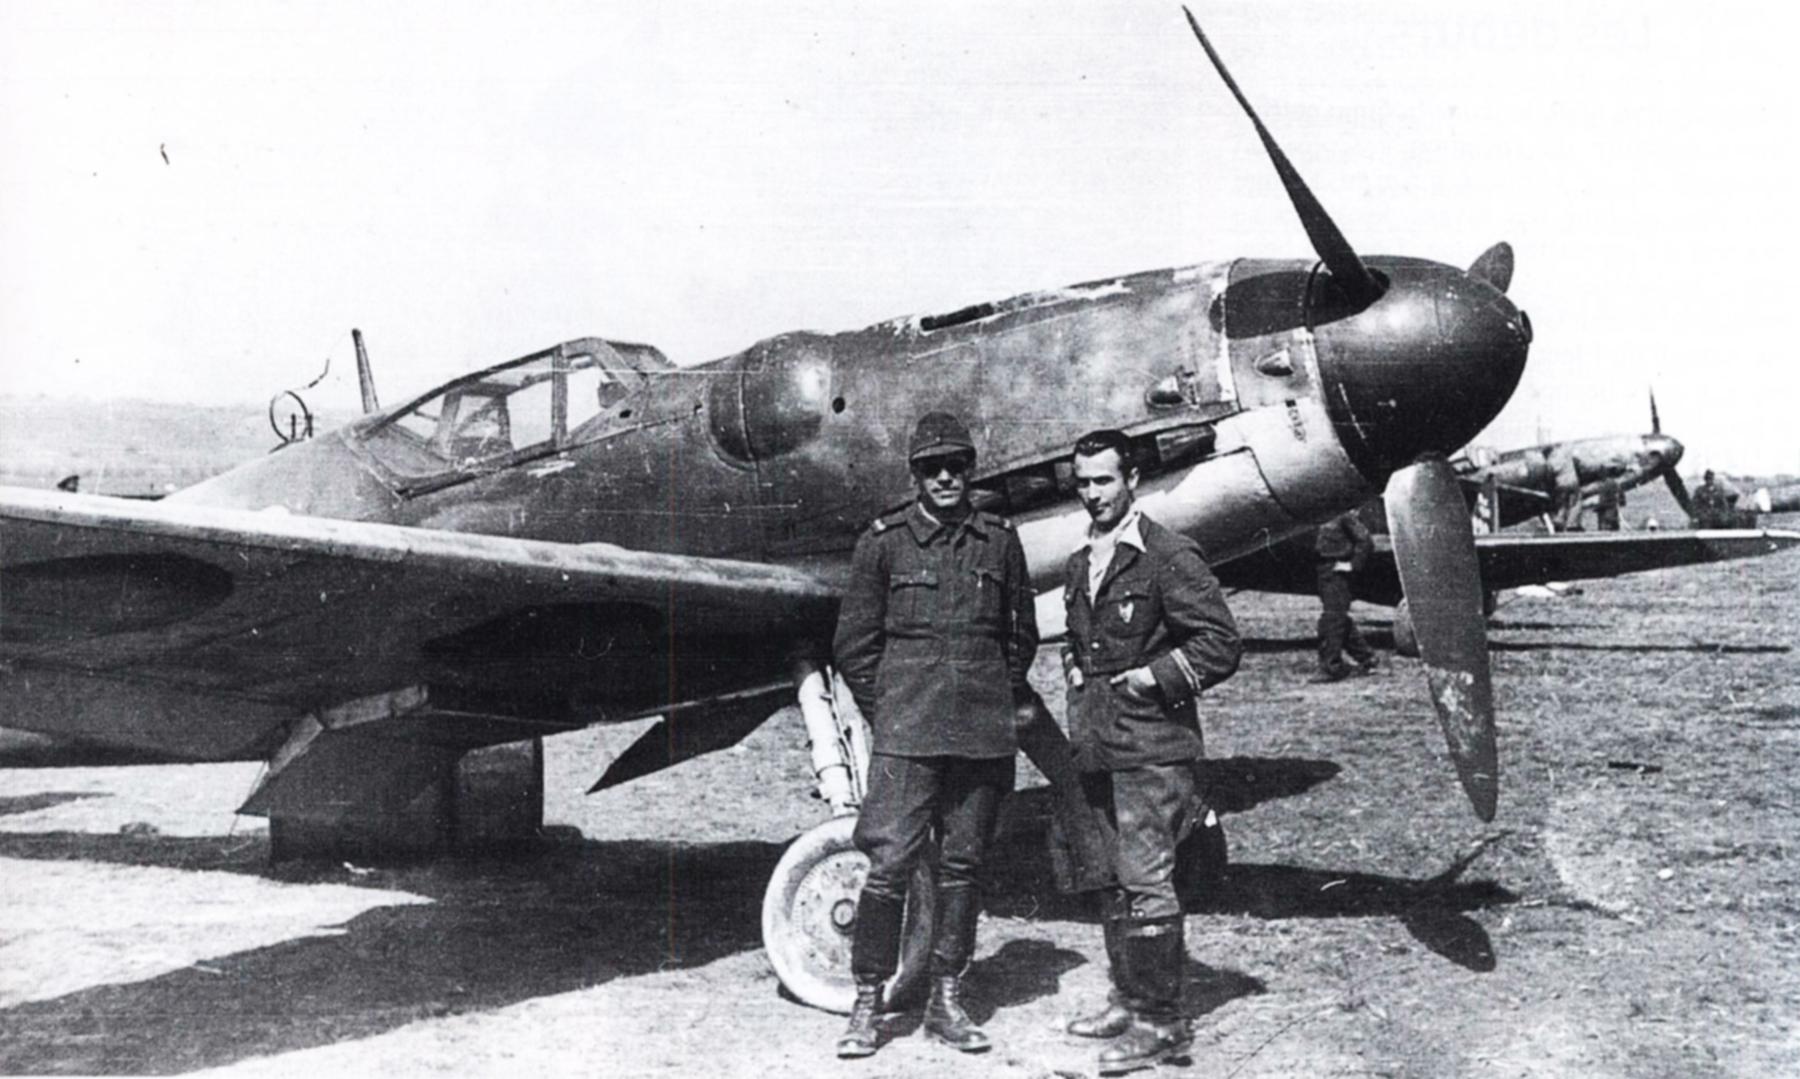 Bf 109G6 Erla ARR Aeronautica Regala Romana photographed in Slovakia 1945 Avions 87 June 2000 P39